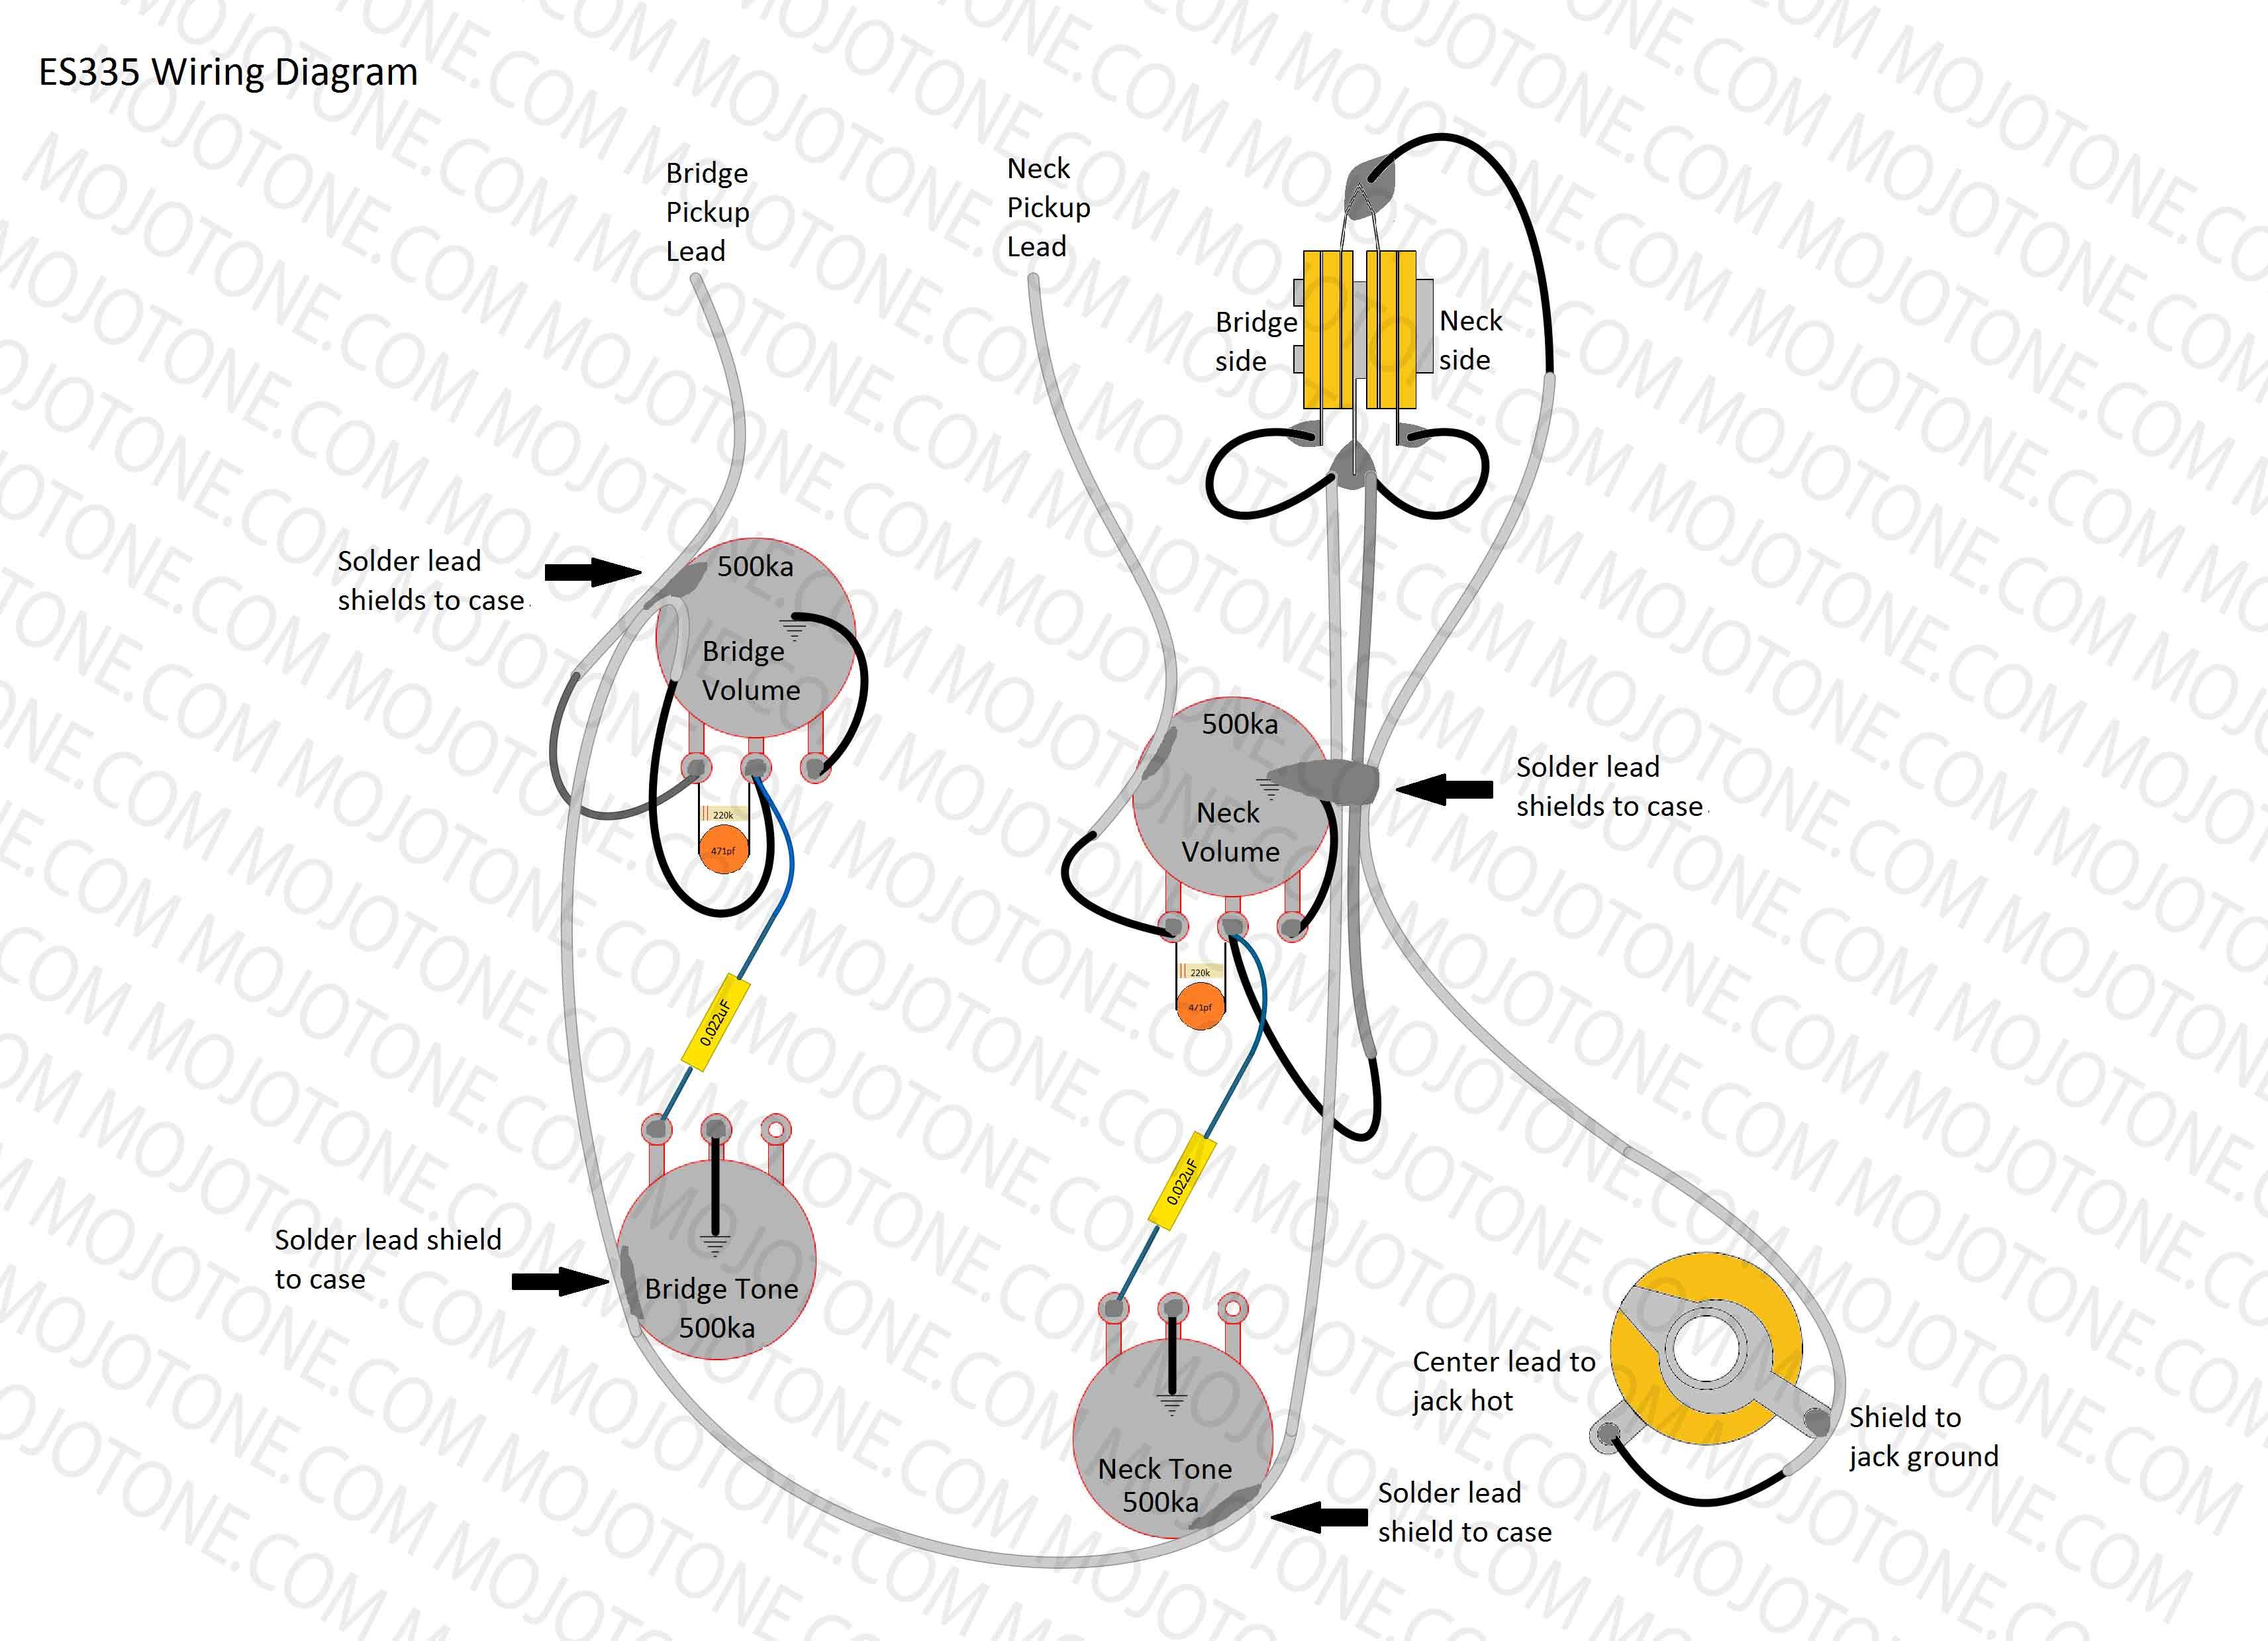 335 Three Way Wiring Diagram - Es 335 Wiring Diagram